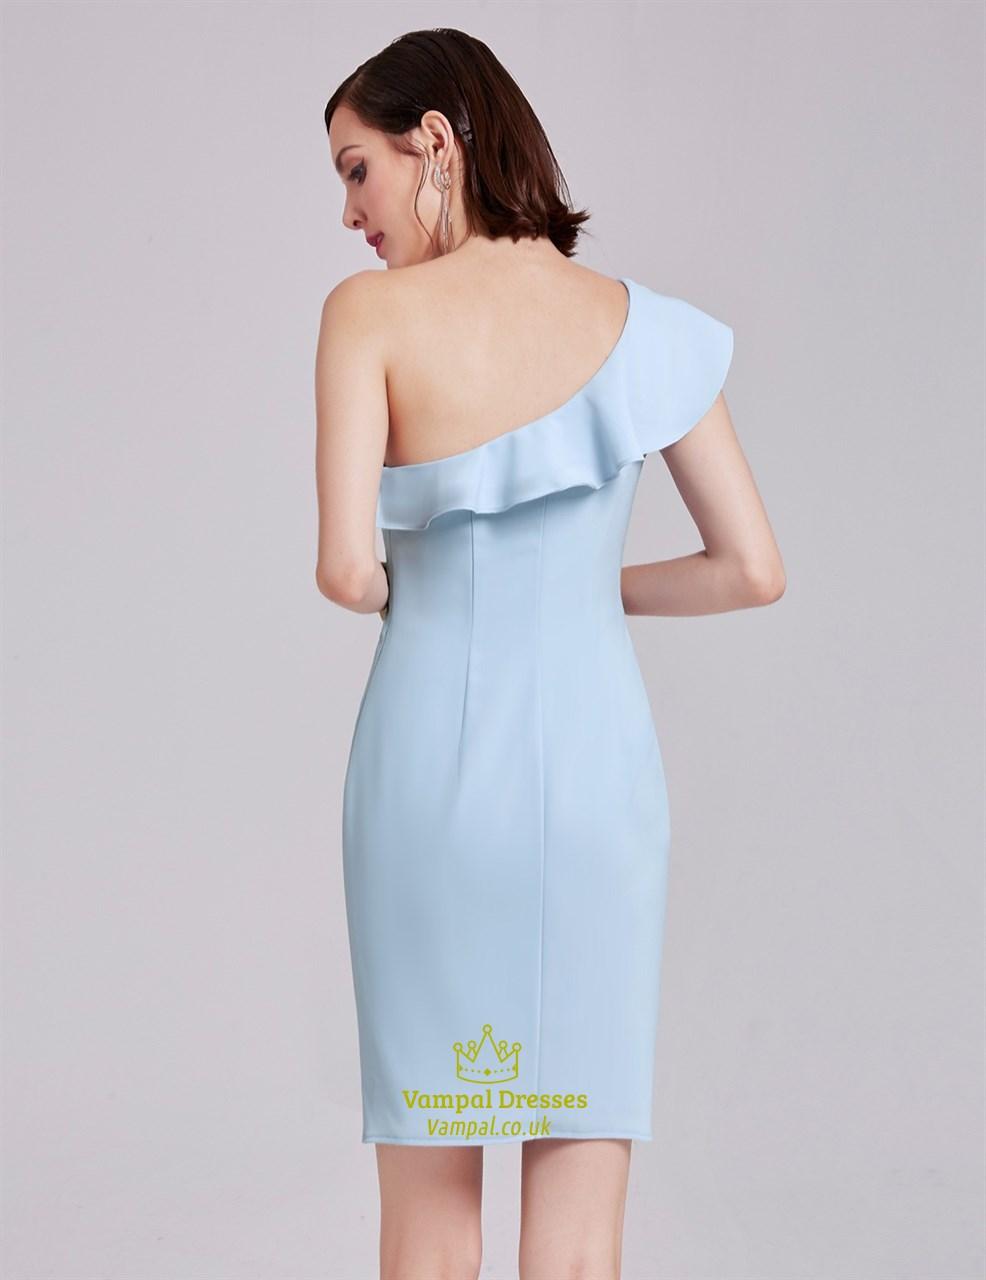 Light Blue Simple One Shoulder Short Sheath Cocktail Dress With Ruffle | Vampal Dresses